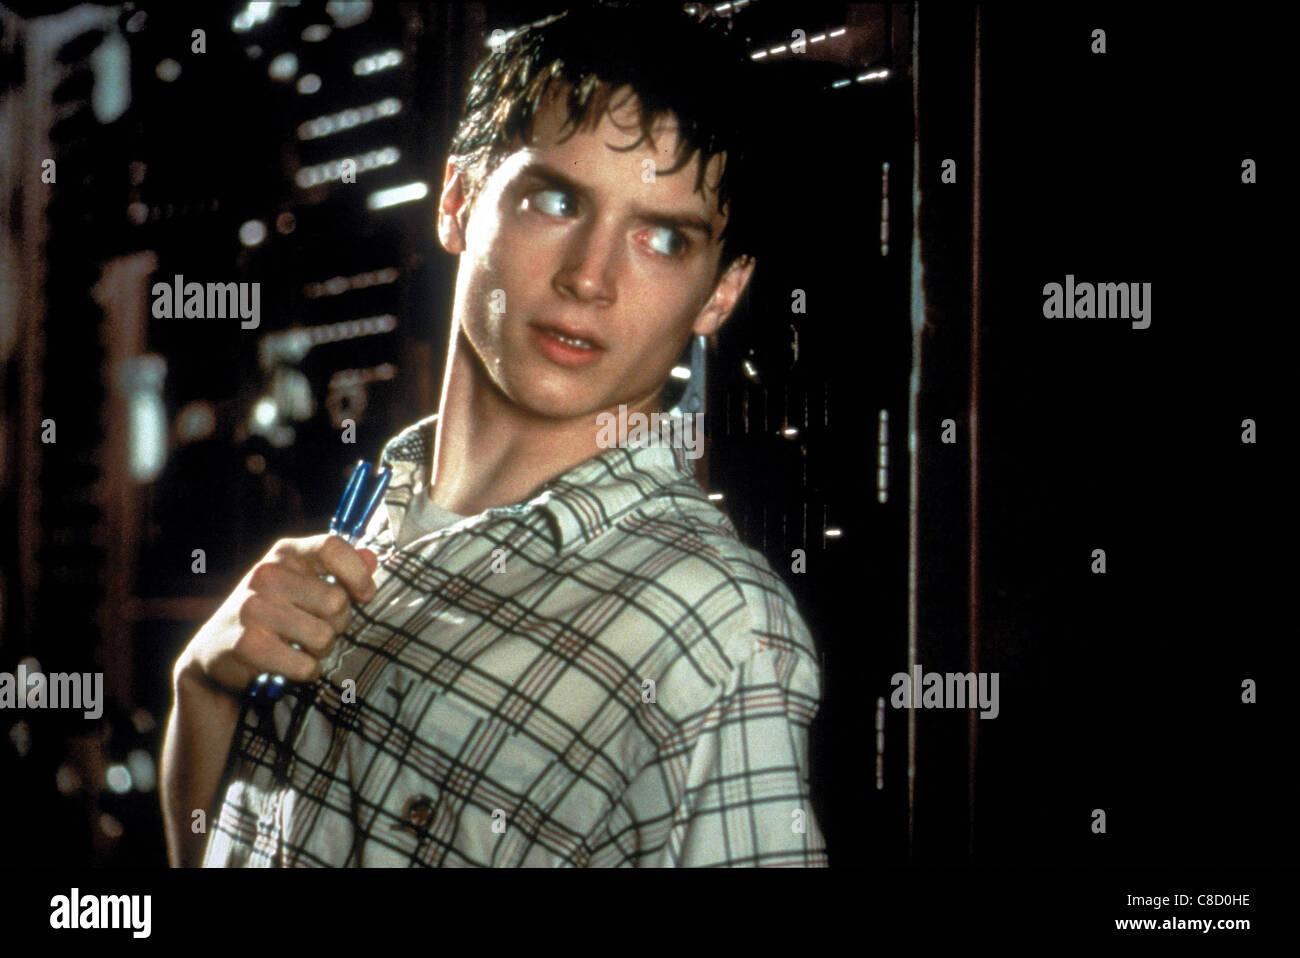 ELIJAH WOOD THE FACULTY (1998) - Stock Image